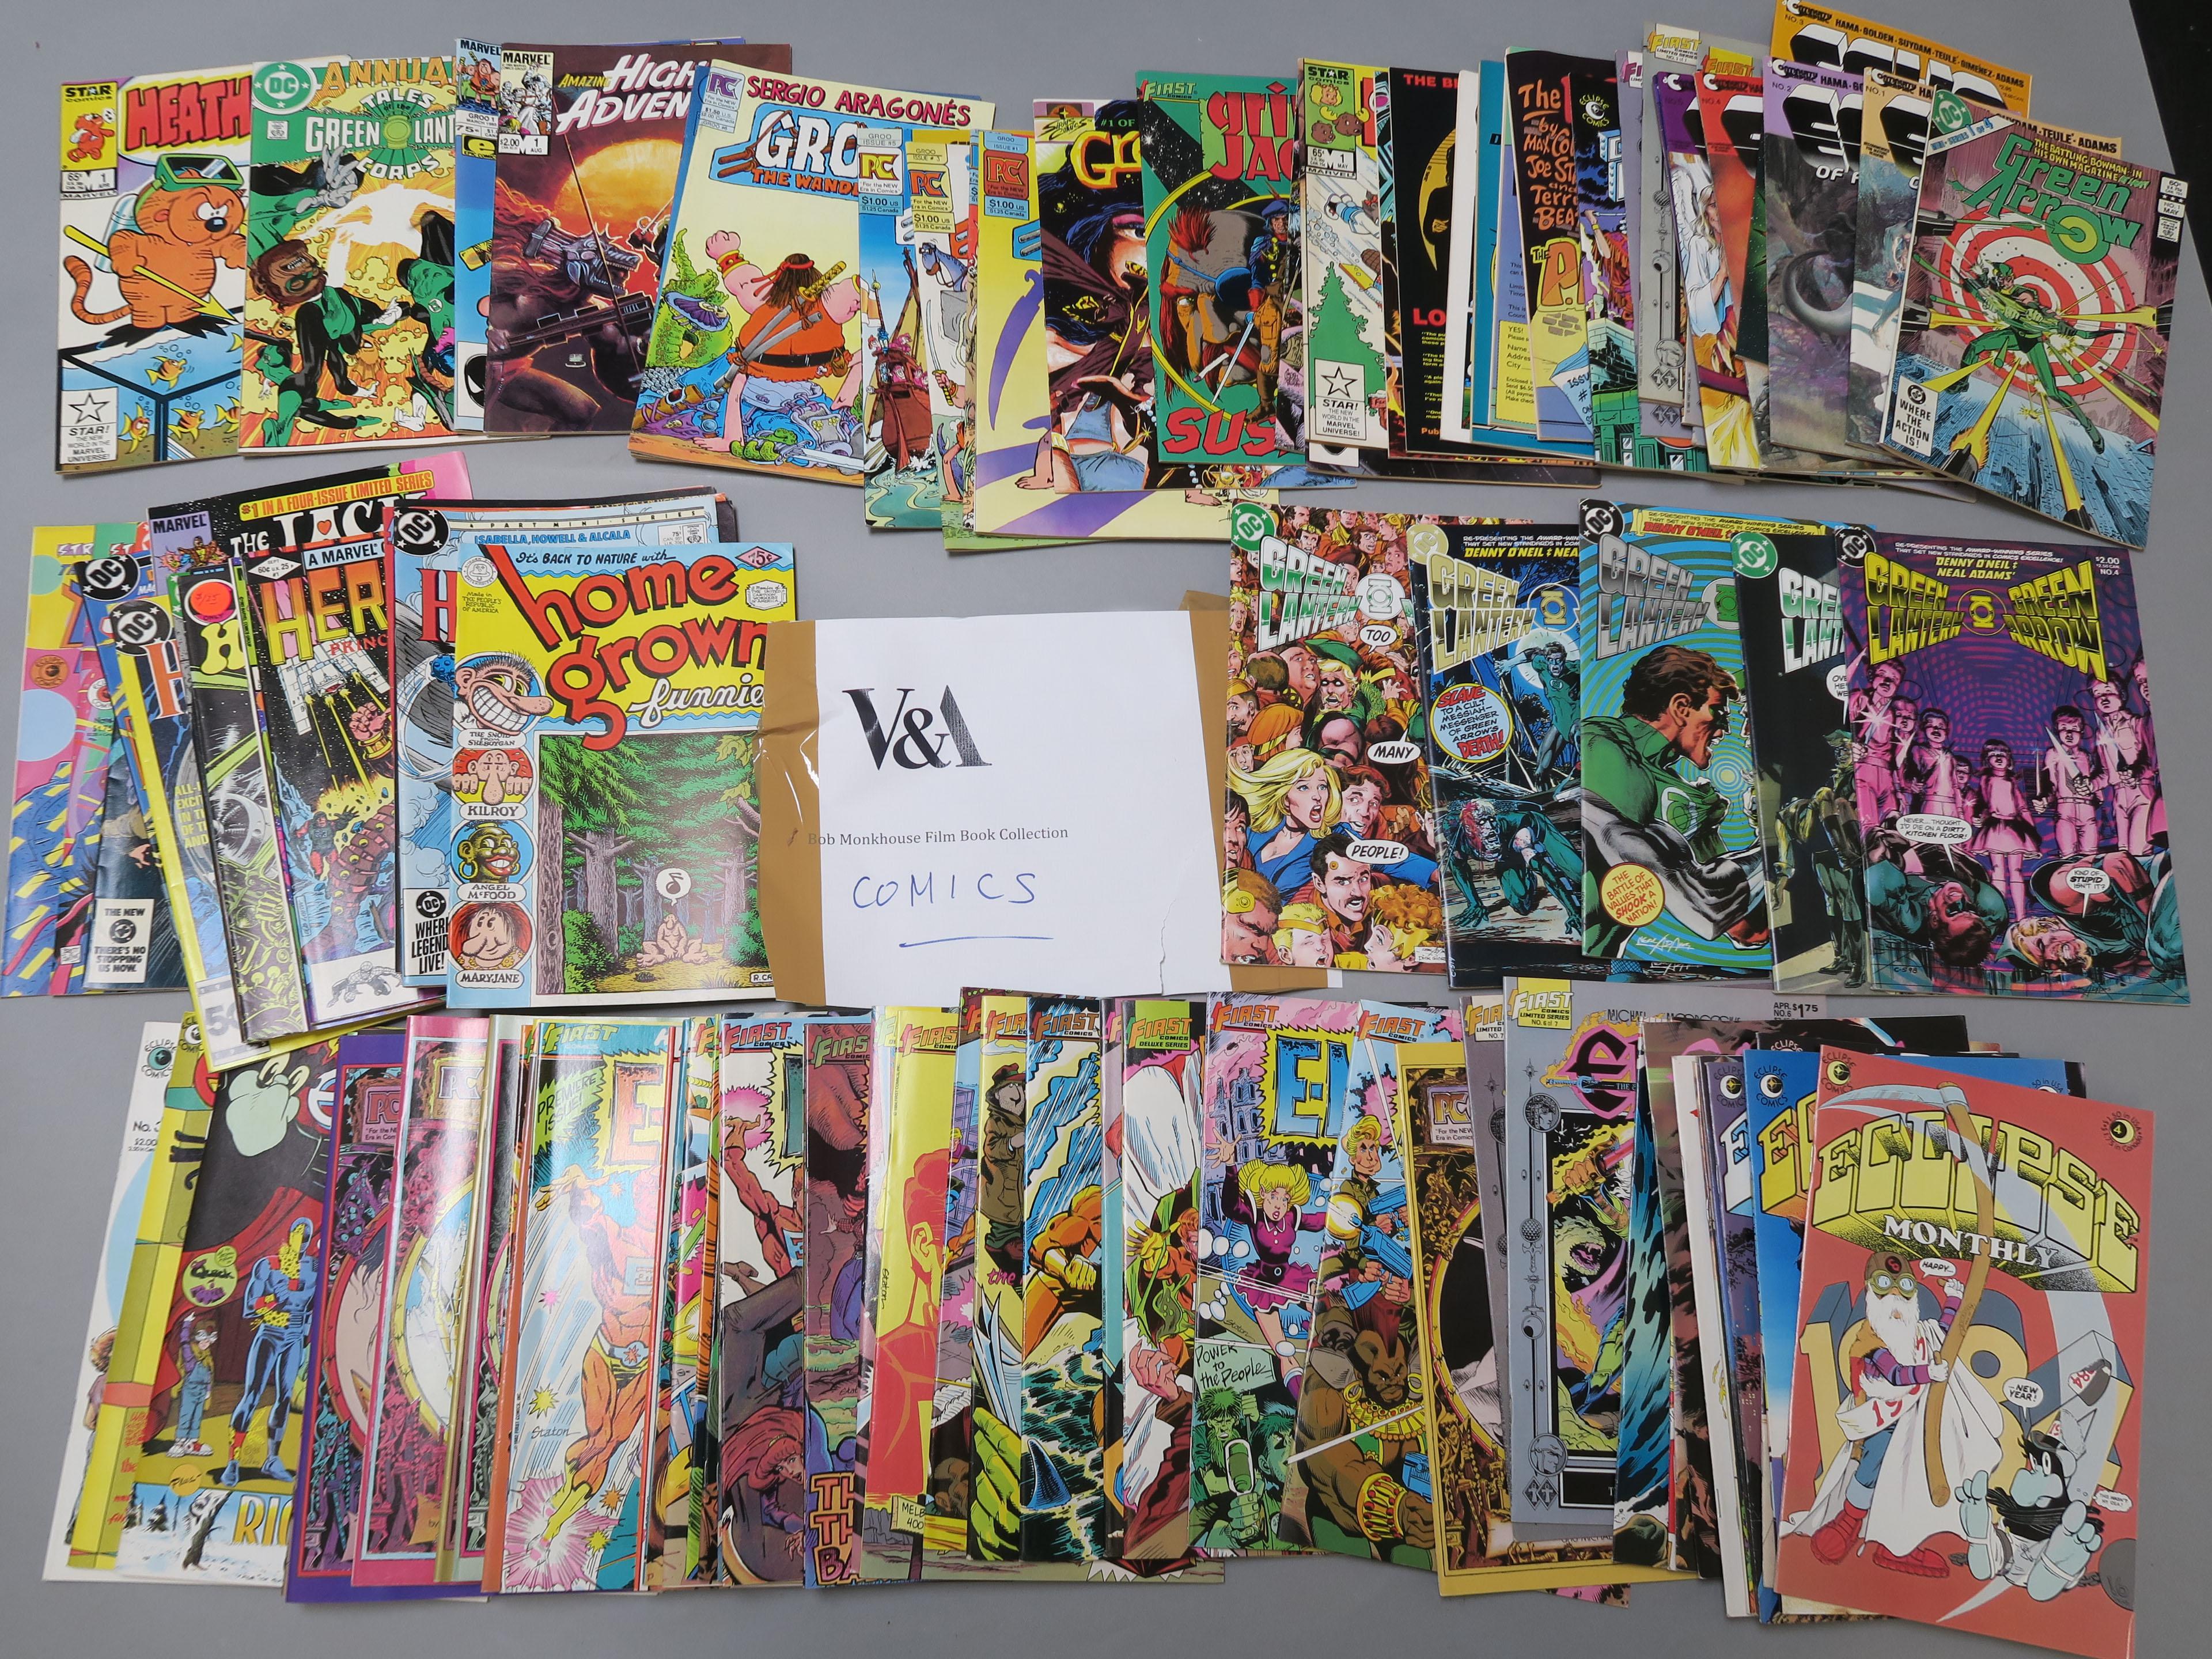 Lot 54 - The following lots are Bob Monkhouse personal books, comics,